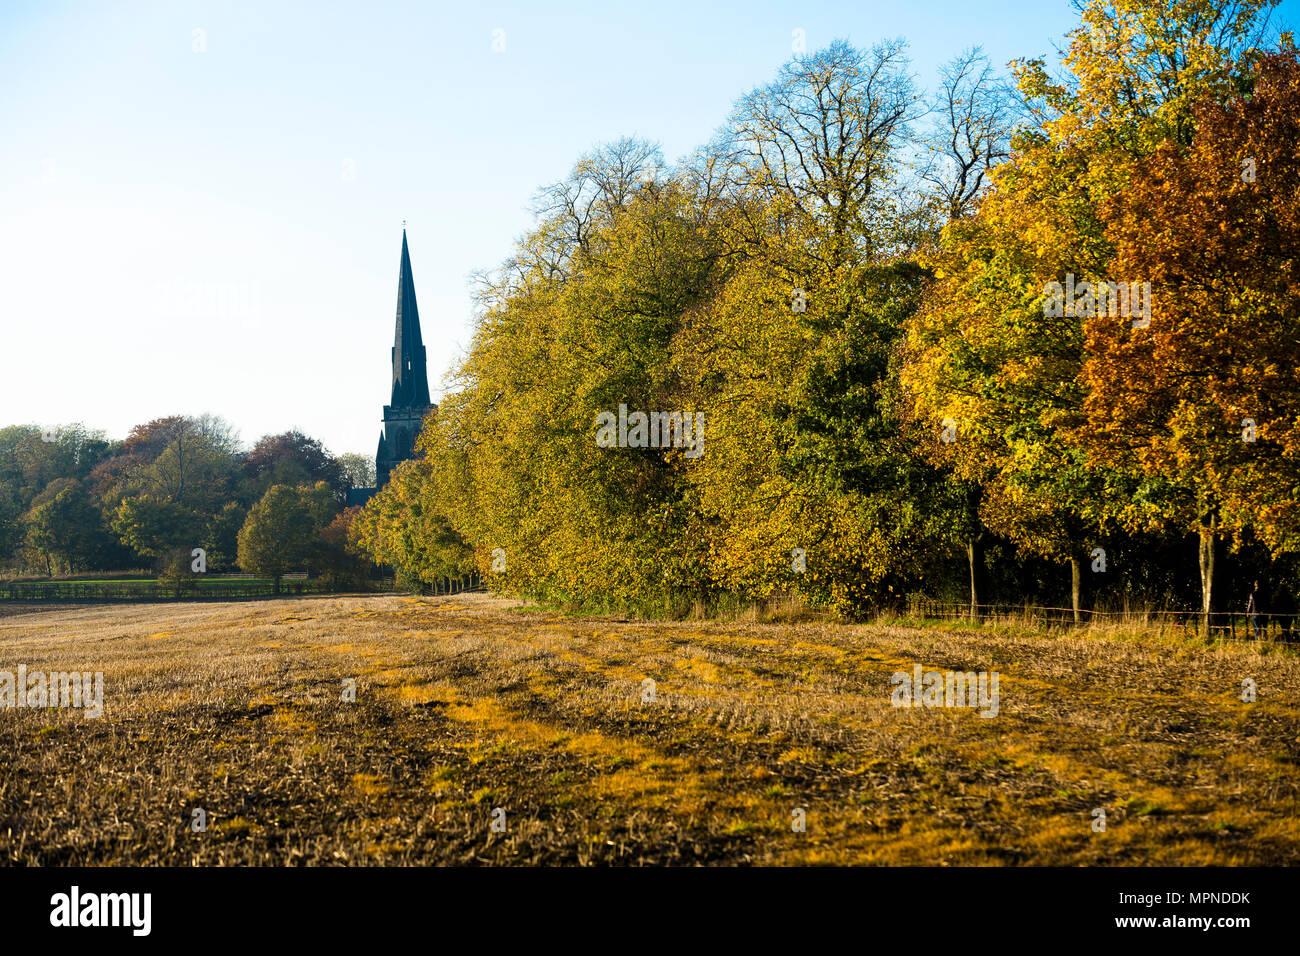 The Parish Church on the Wentworh Estate - Stock Image